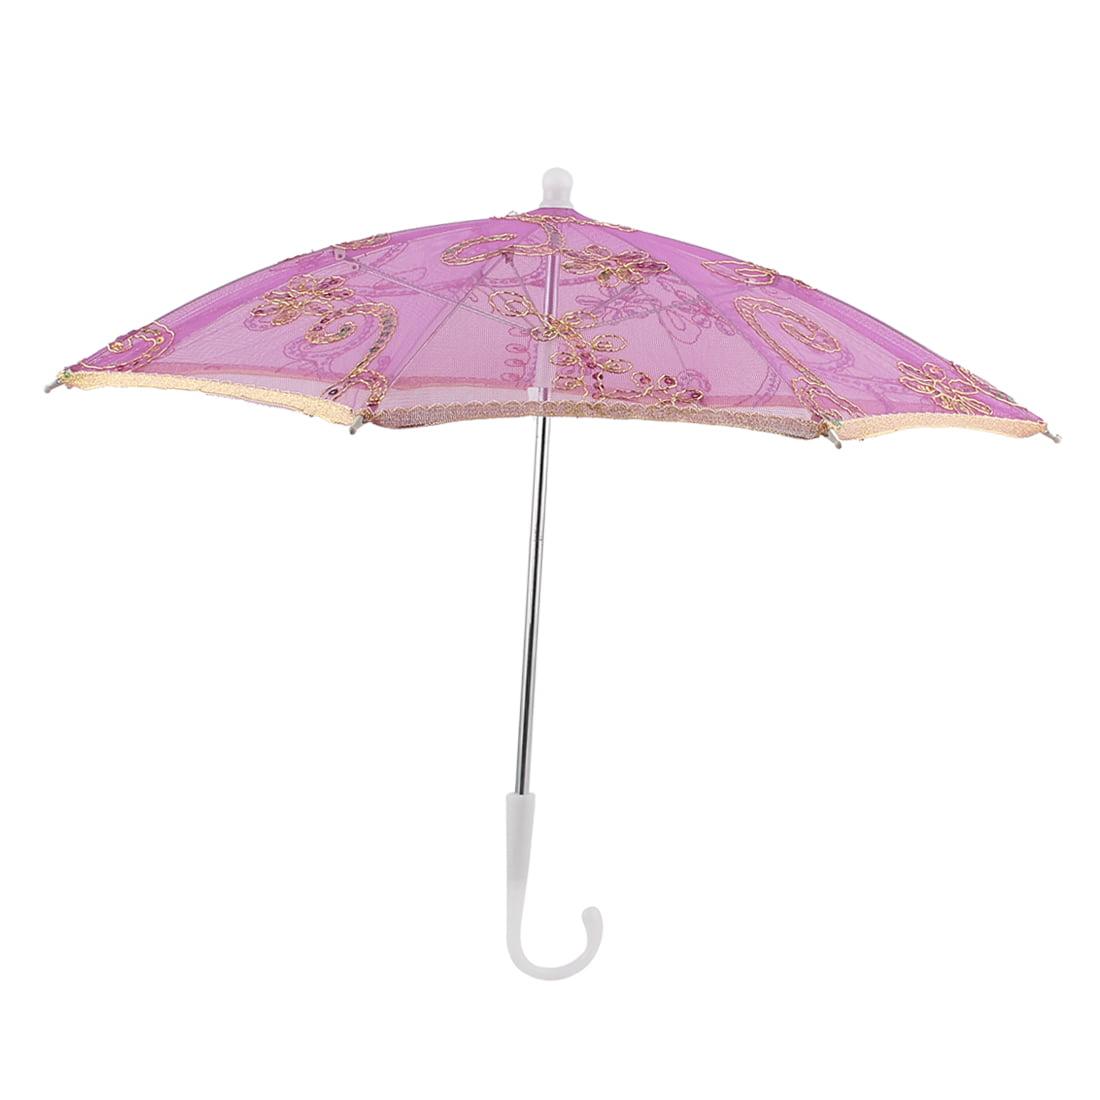 Unique Bargains Dancing Gold Tone Edge Flower Pattern Nylon Mini Lace Parasol Umbrella Fuchsia - image 5 de 5